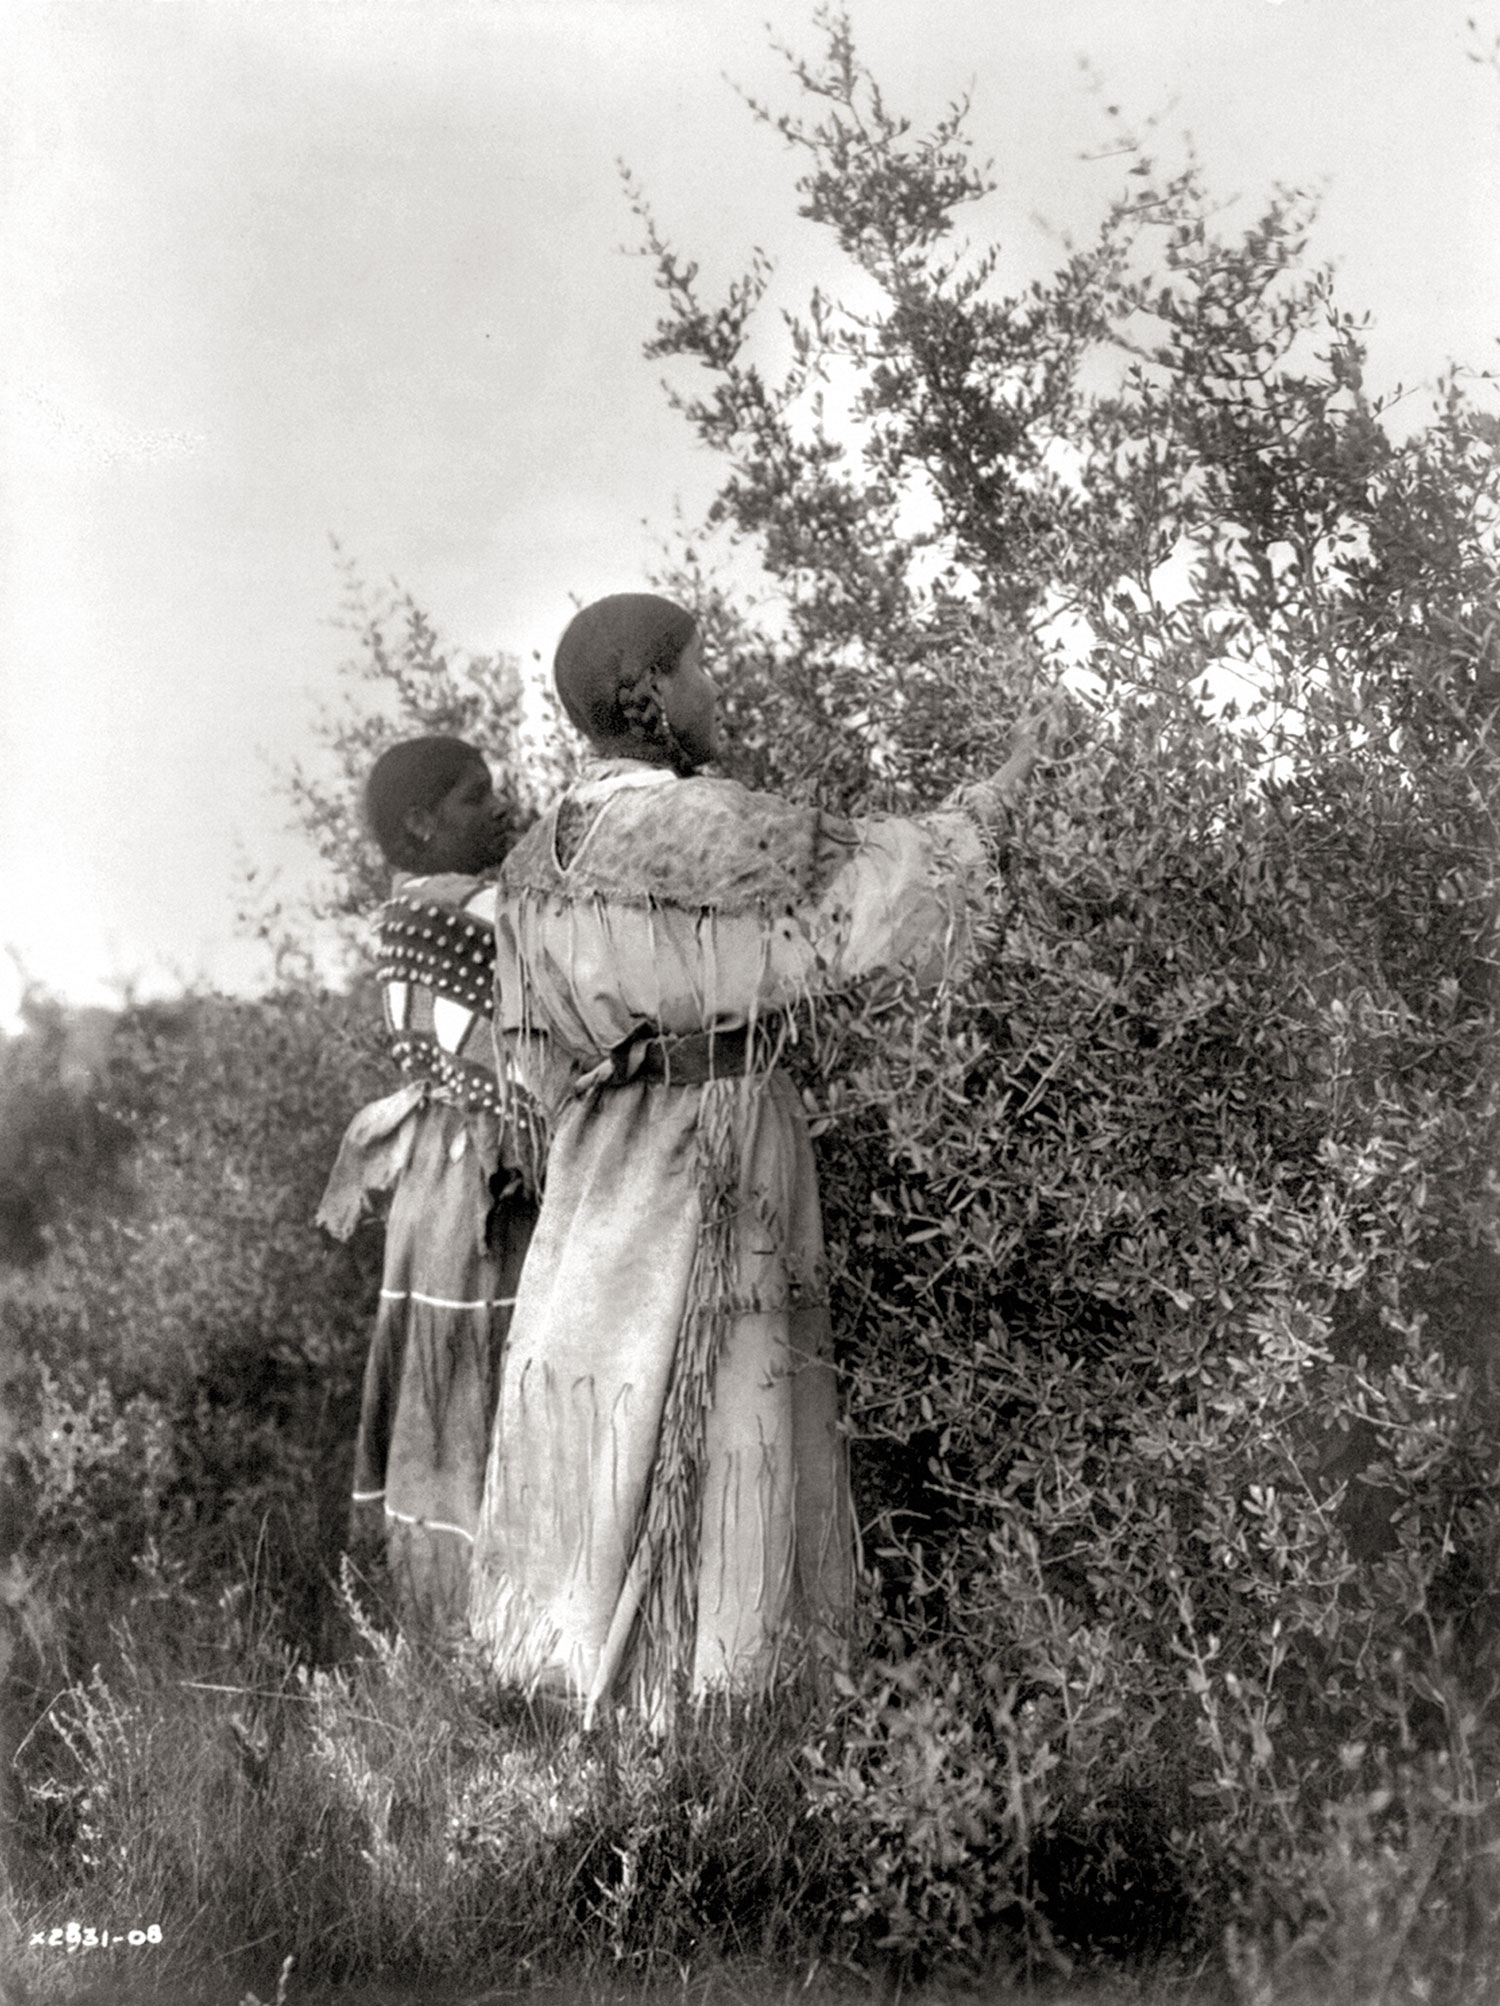 Mandans-gathering-buffalo-berries-1908.-Photograph-by-Edward-S.-Curtis